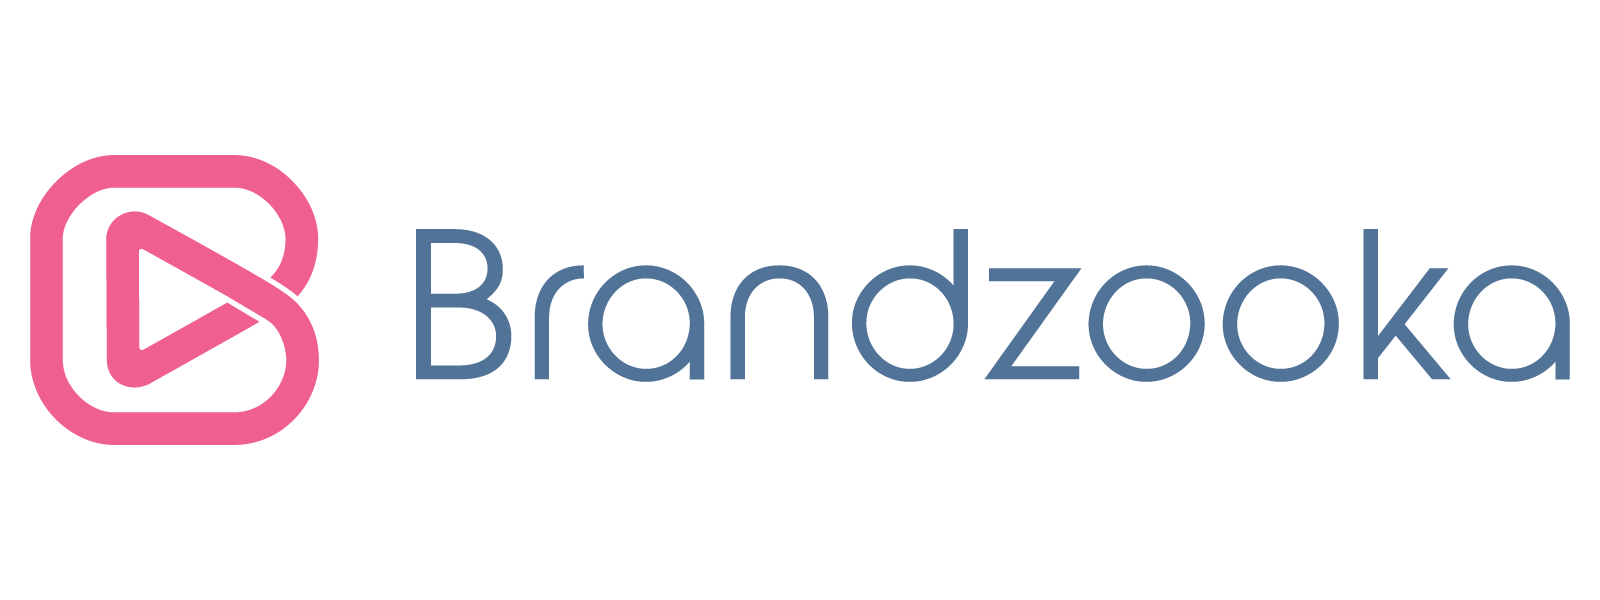 brandzooka_logo_for_light_brackground.png